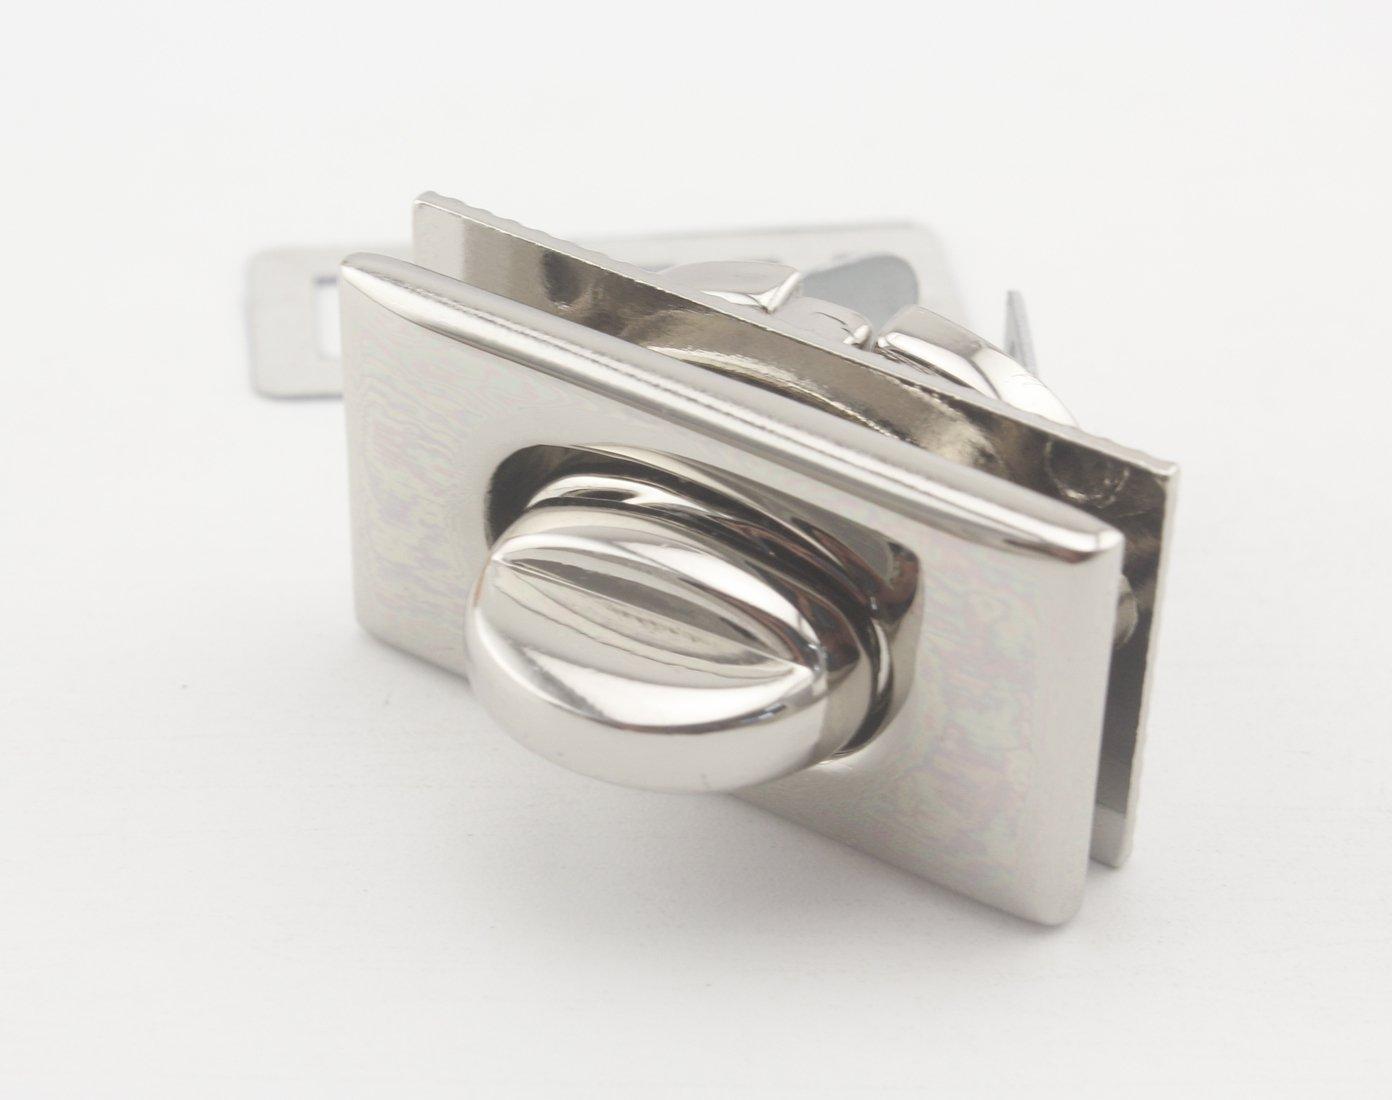 Rettangolo borsa Twist lock Turn Lock nickel 1246 Nikel 3DAN